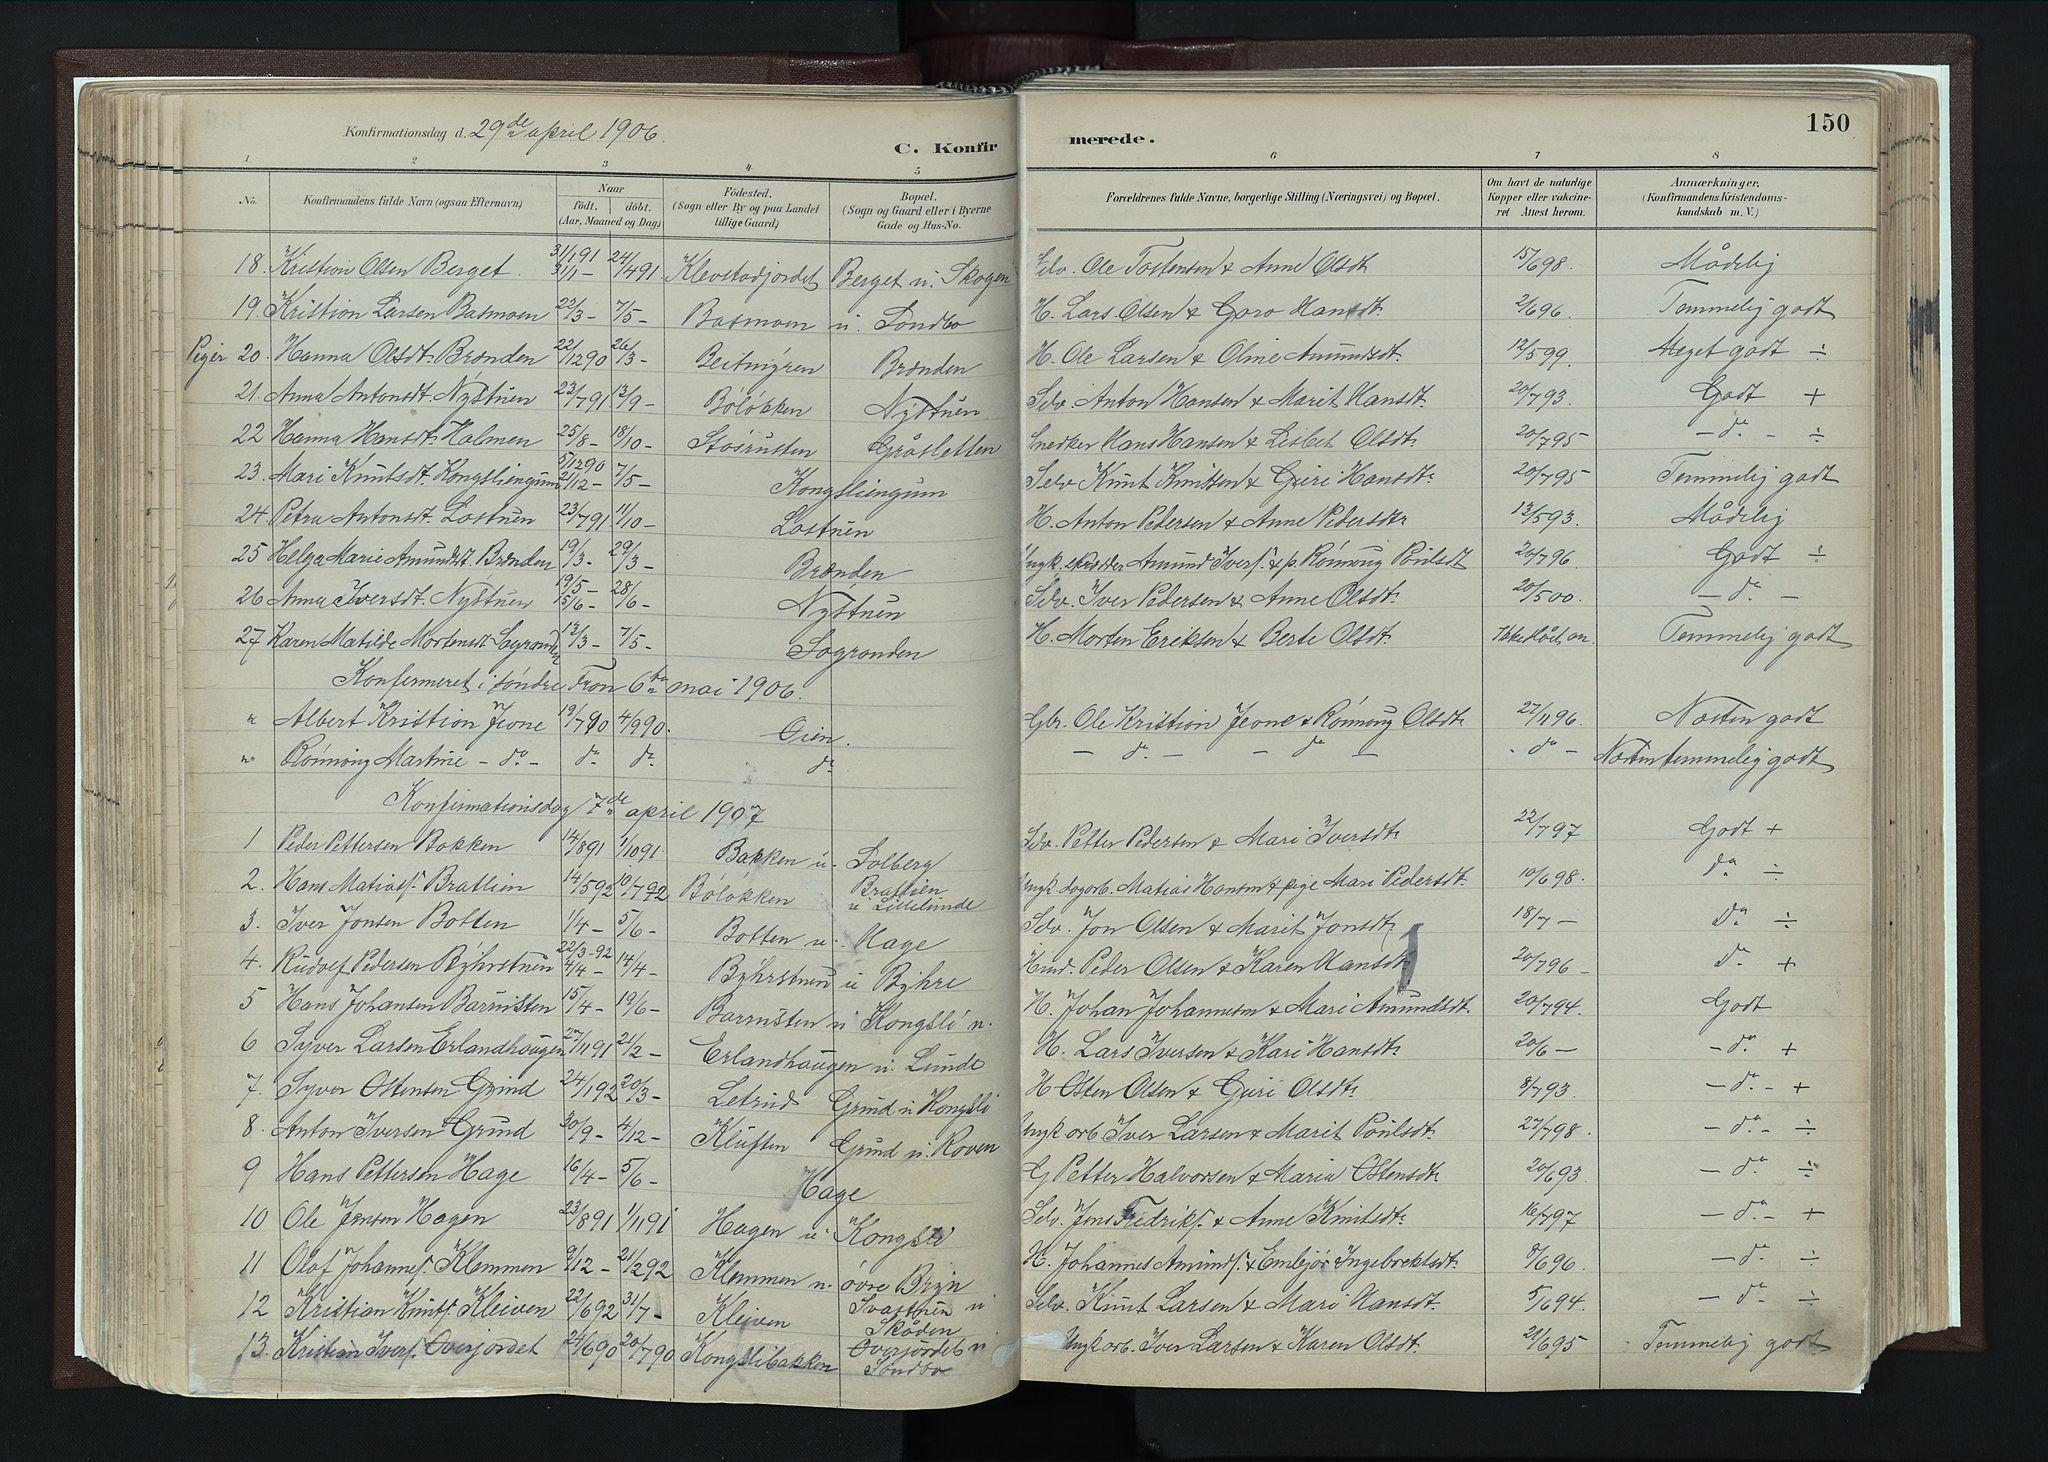 SAH, Nord-Fron prestekontor, Ministerialbok nr. 4, 1884-1914, s. 150